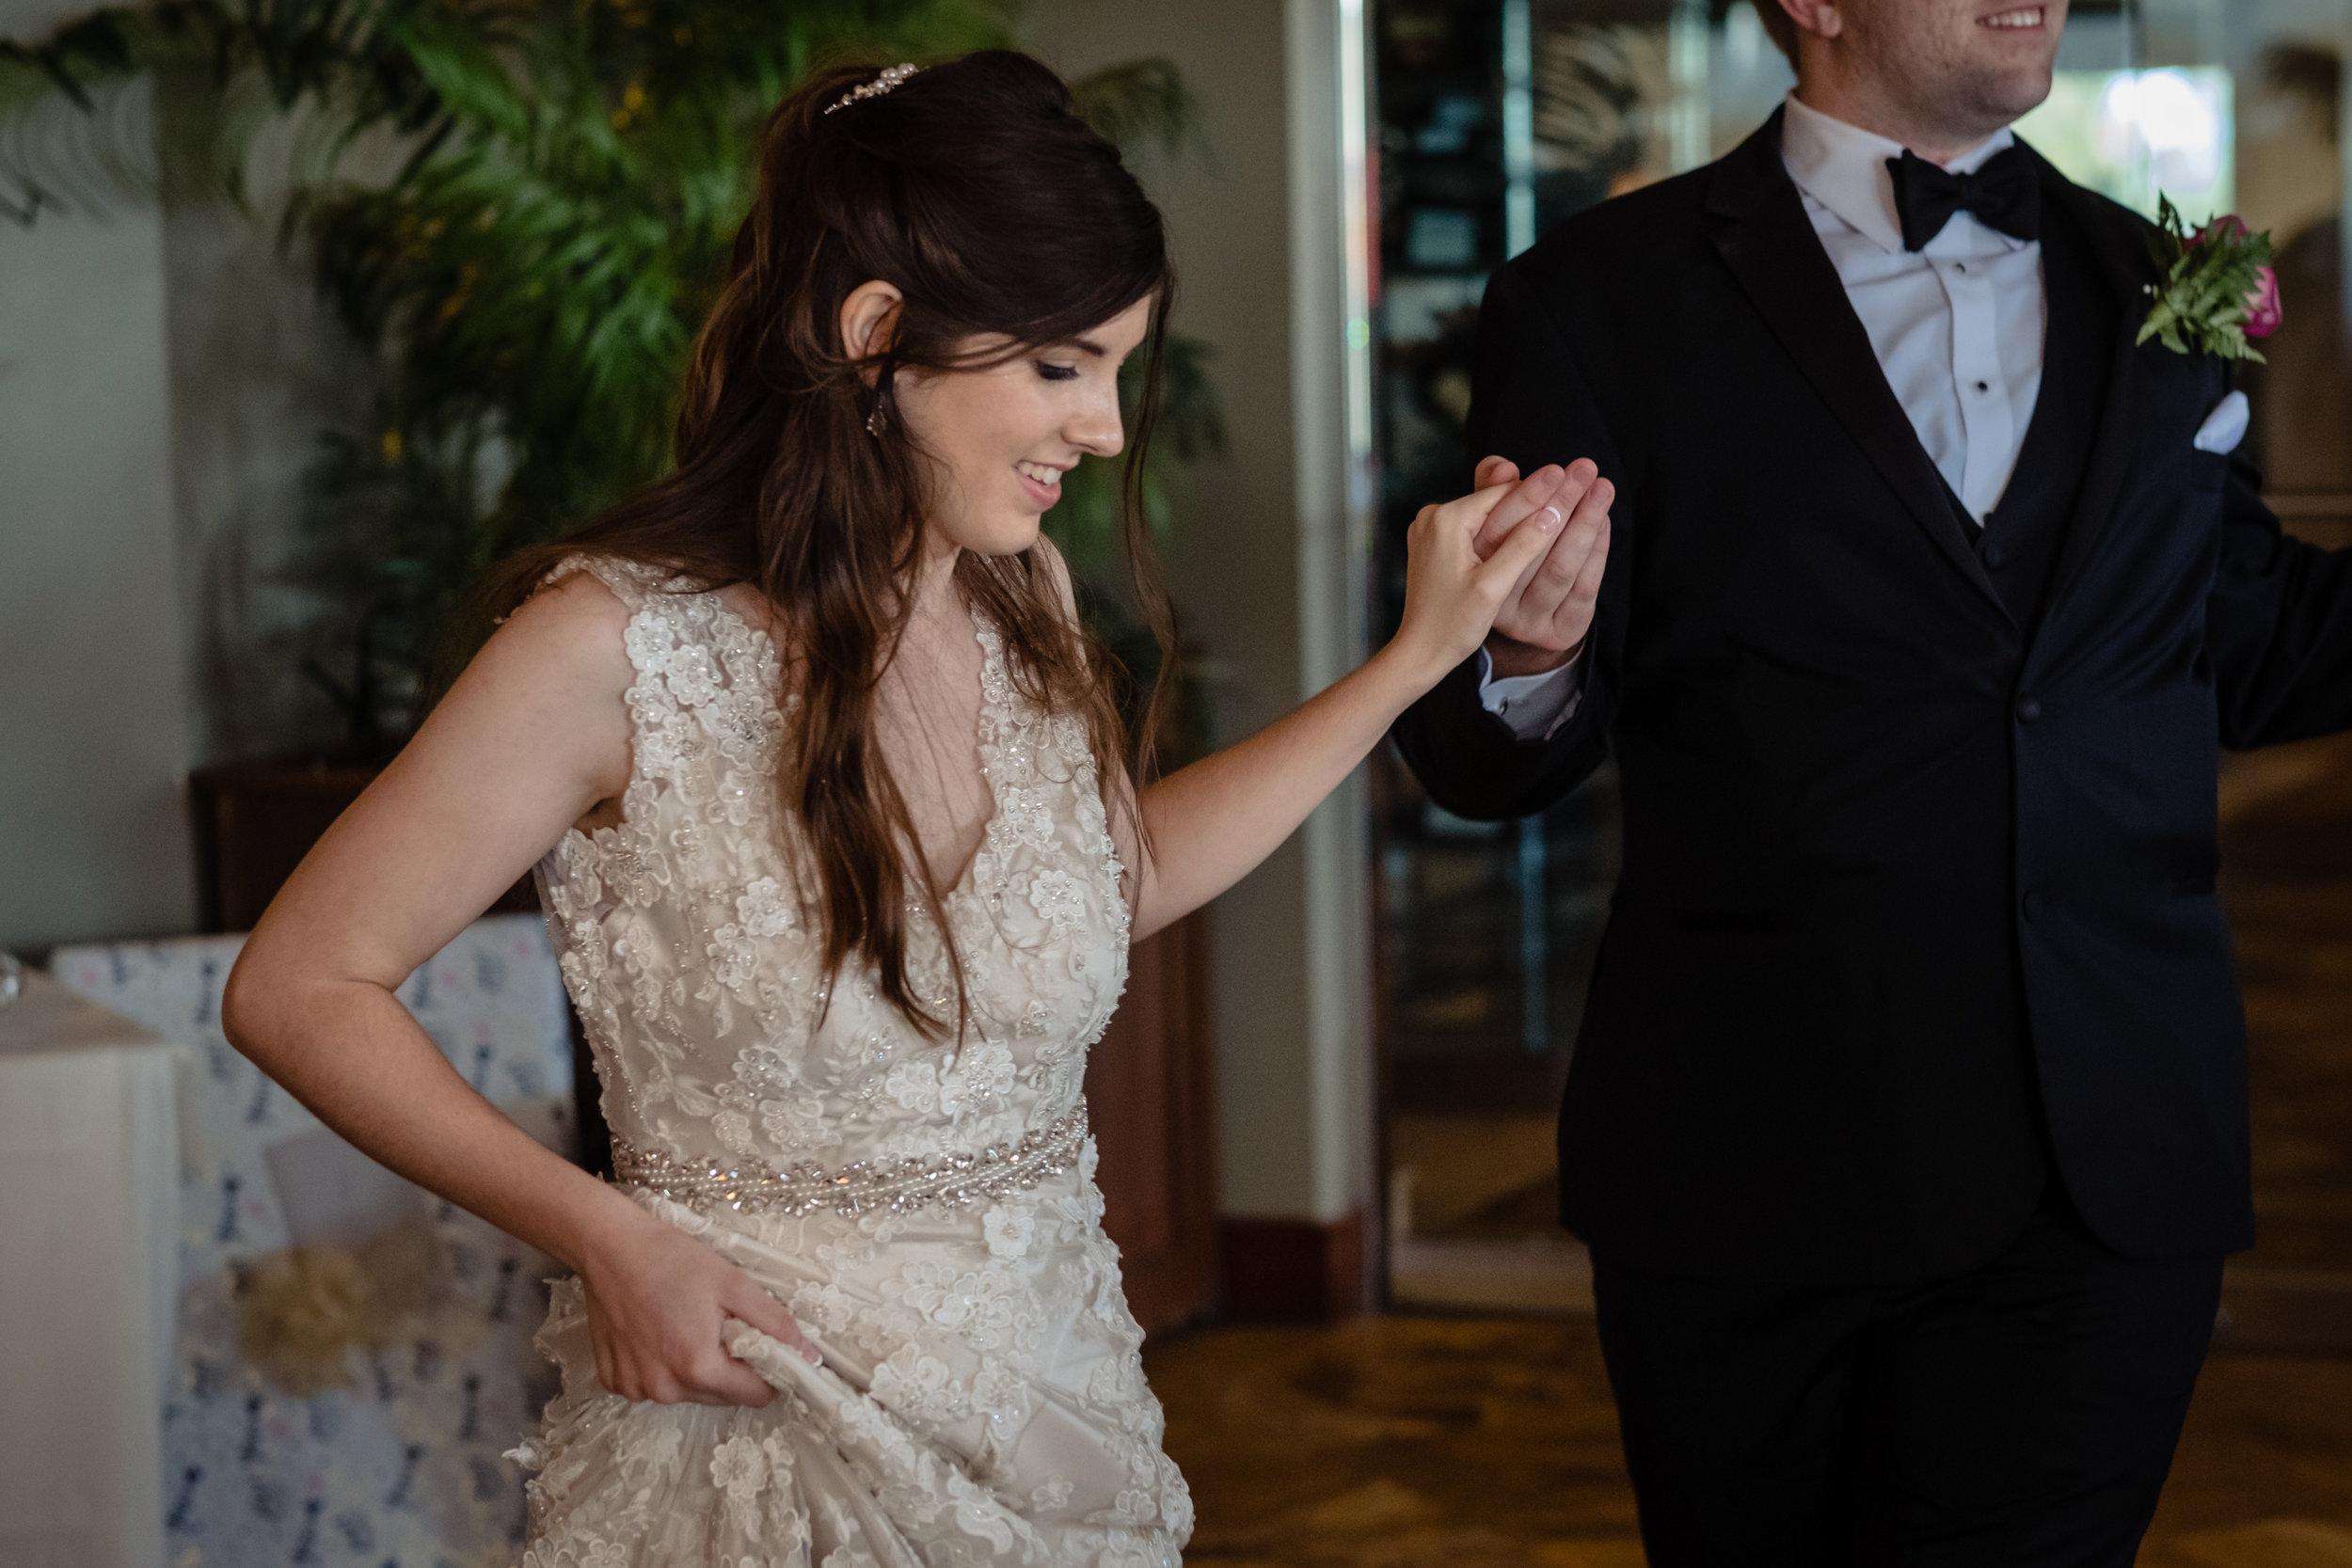 HAH_Zoe and Daniel_Clearwater Wedding_536_2018.jpg